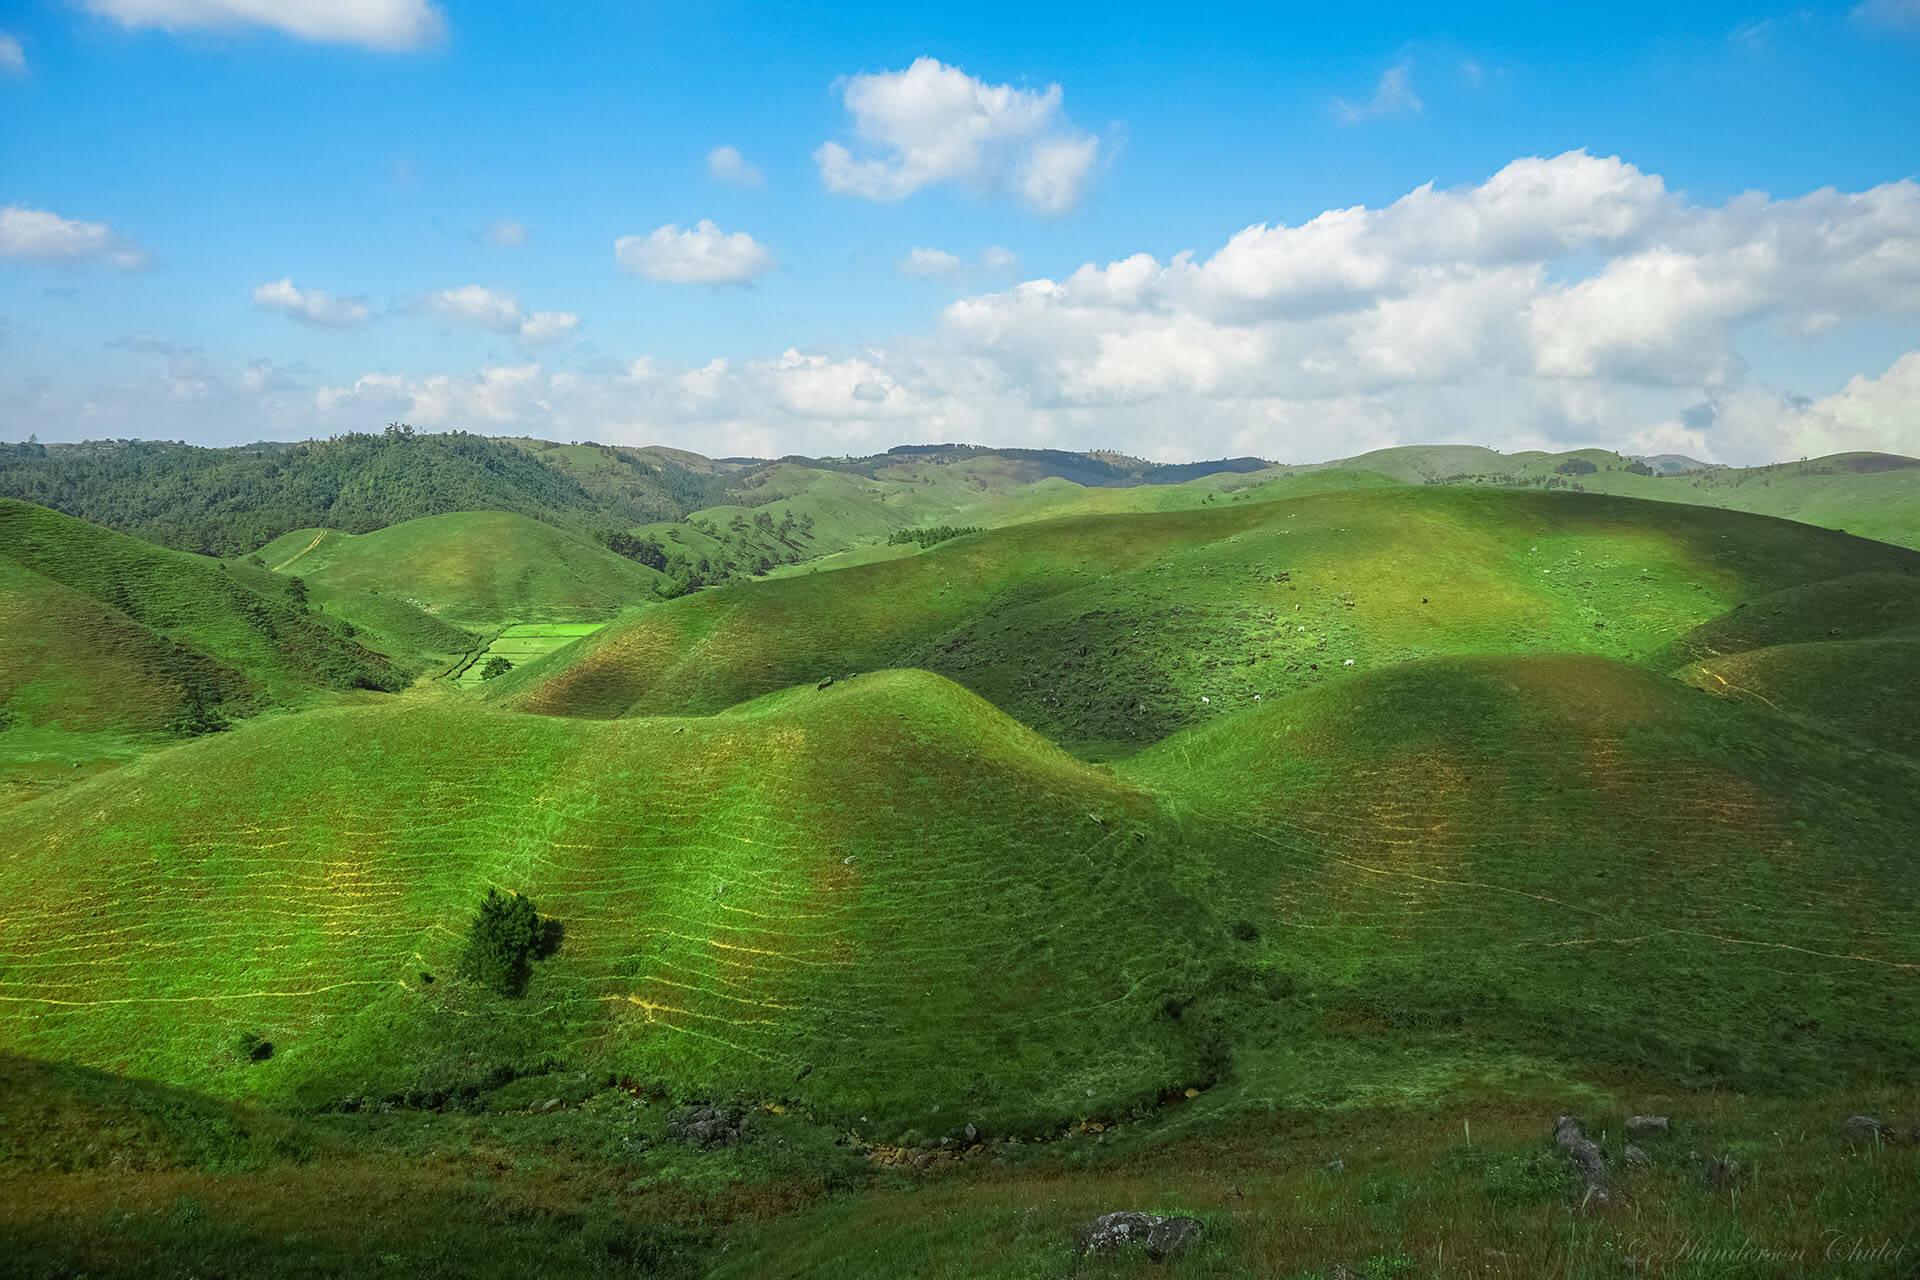 Meghalaya's Landscapes - West Khasi Hills